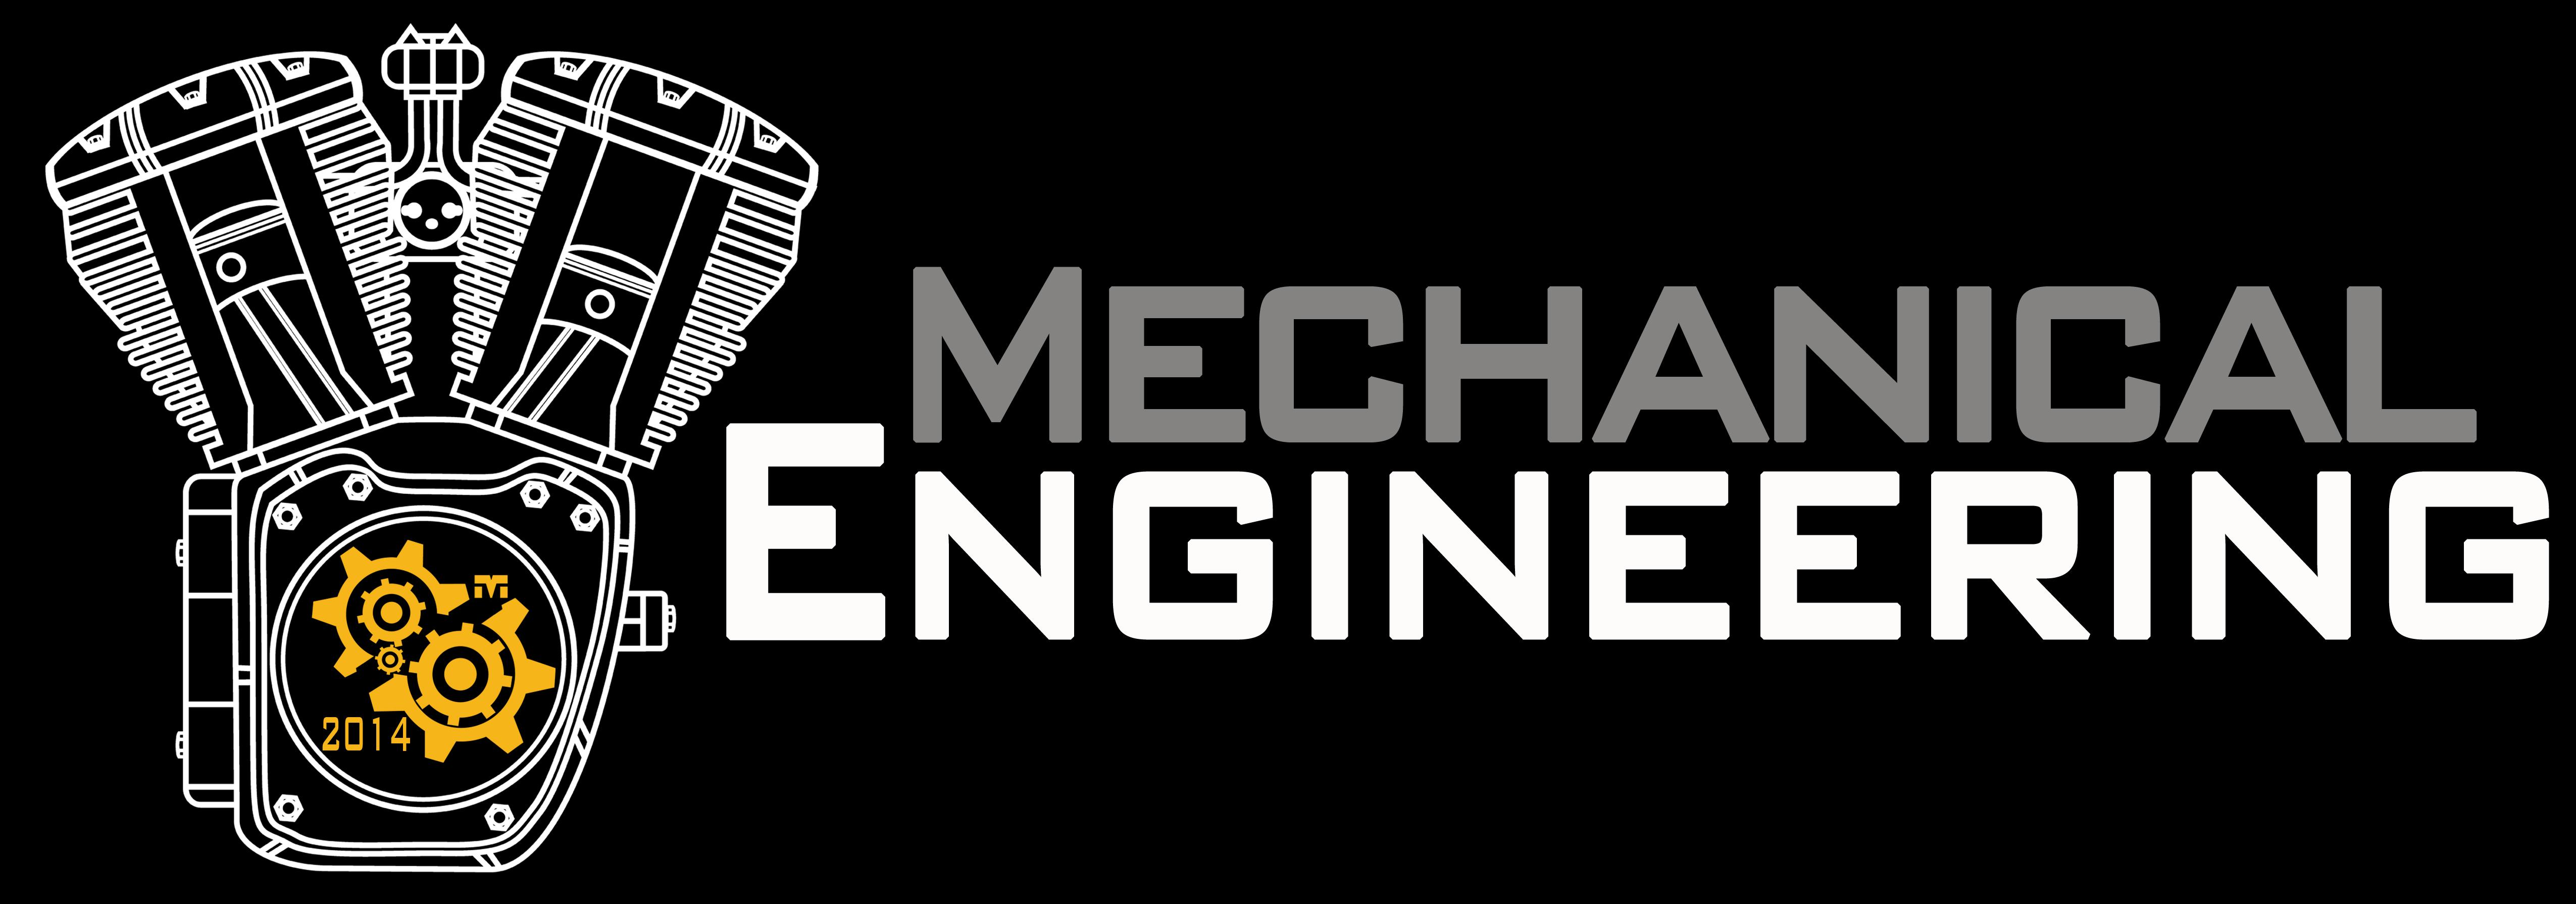 Mechanical engineering logo - photo#2